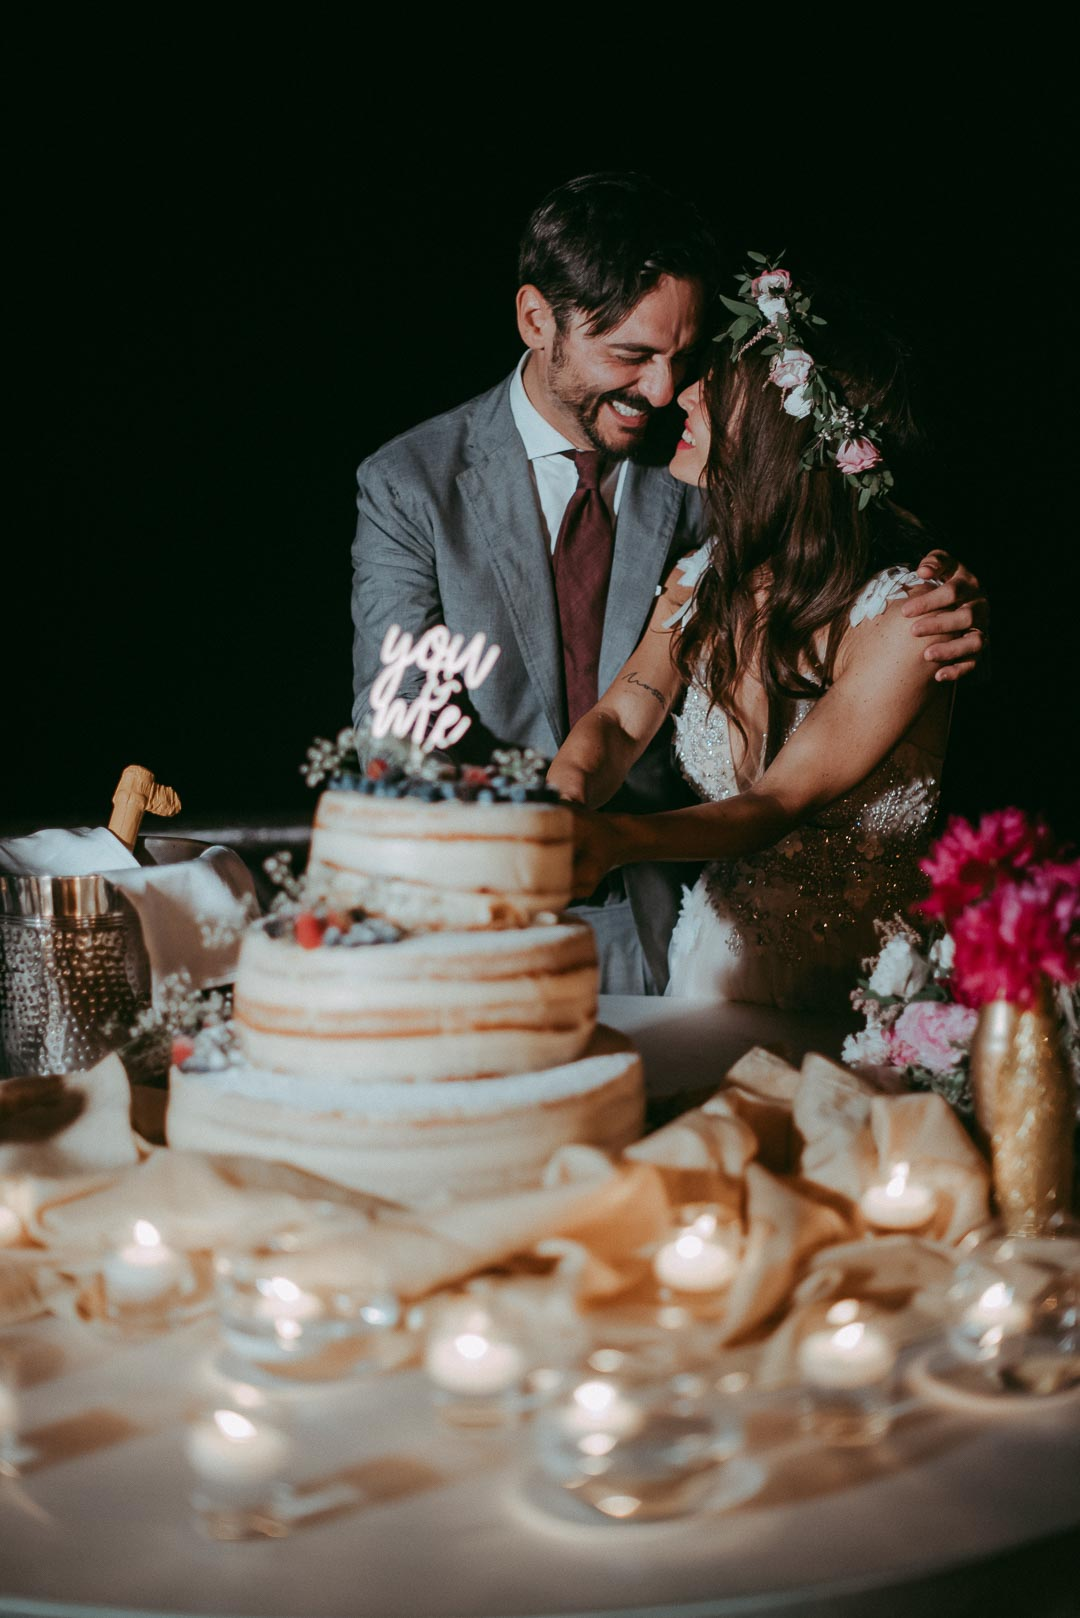 wedding-photographer-destination-fineart-bespoke-reportage-amalficoast-torrelacerniola-vivianeizzo-spazio46-98